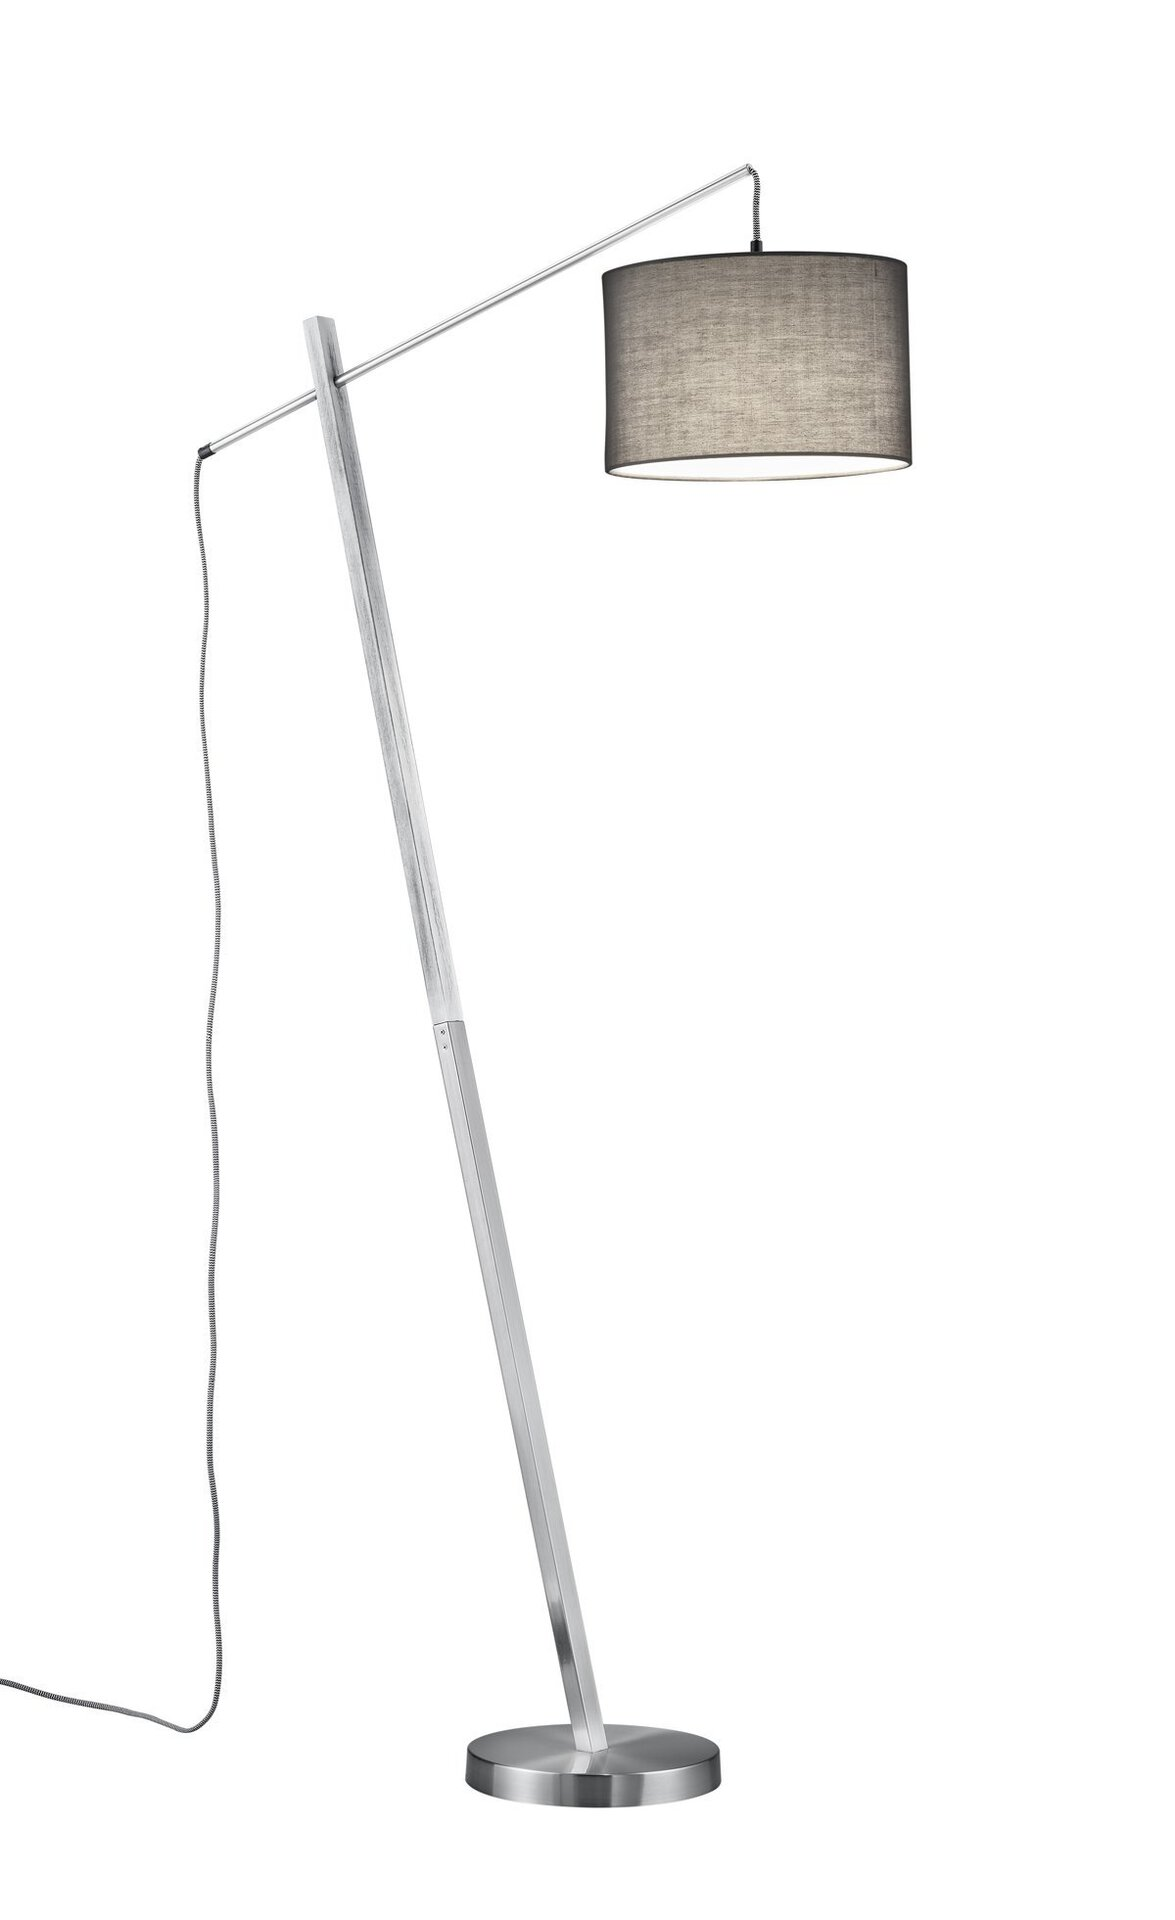 Stehleuchte Padme Reality Leuchten Metall 163 x 30 cm